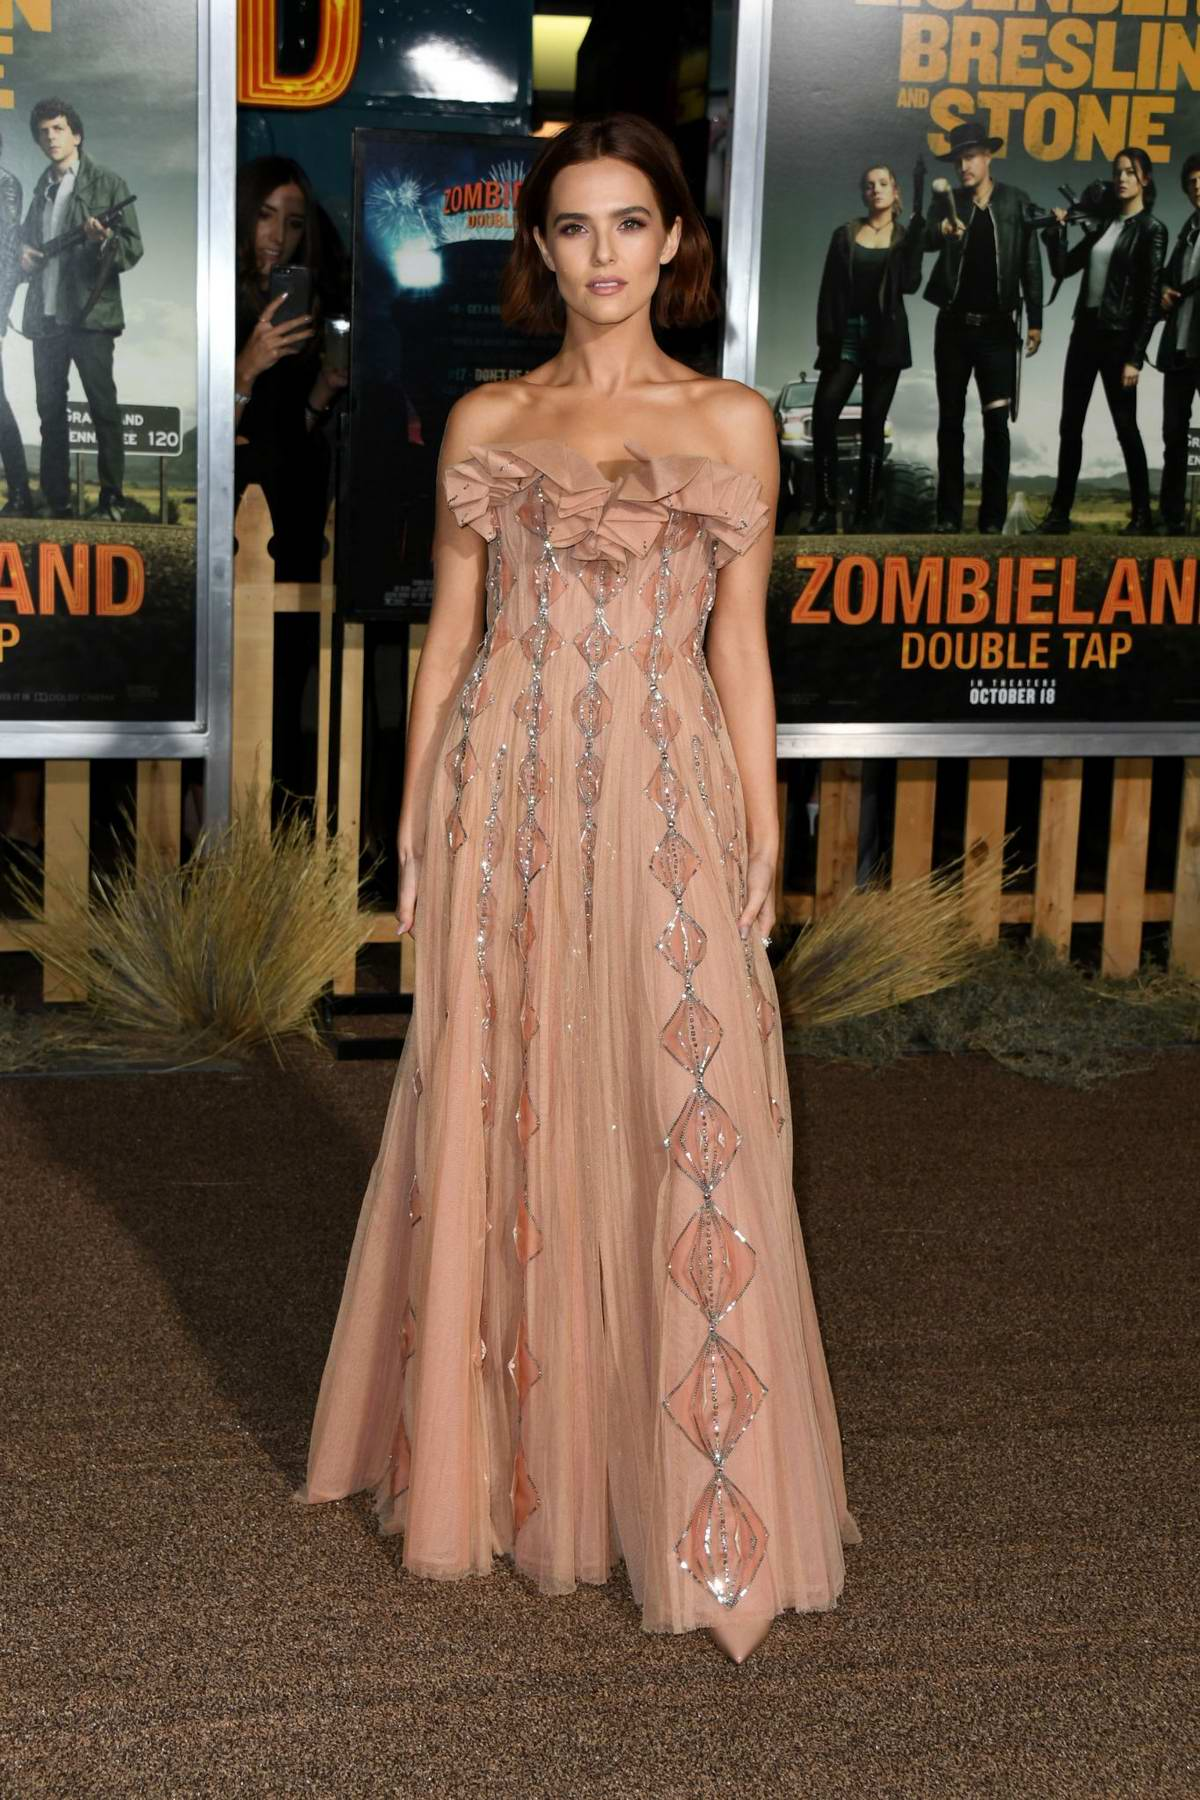 Zoey Deutch attends 'Zombieland: Double Tap' premiere at Regency Village Theater in Westwood, California